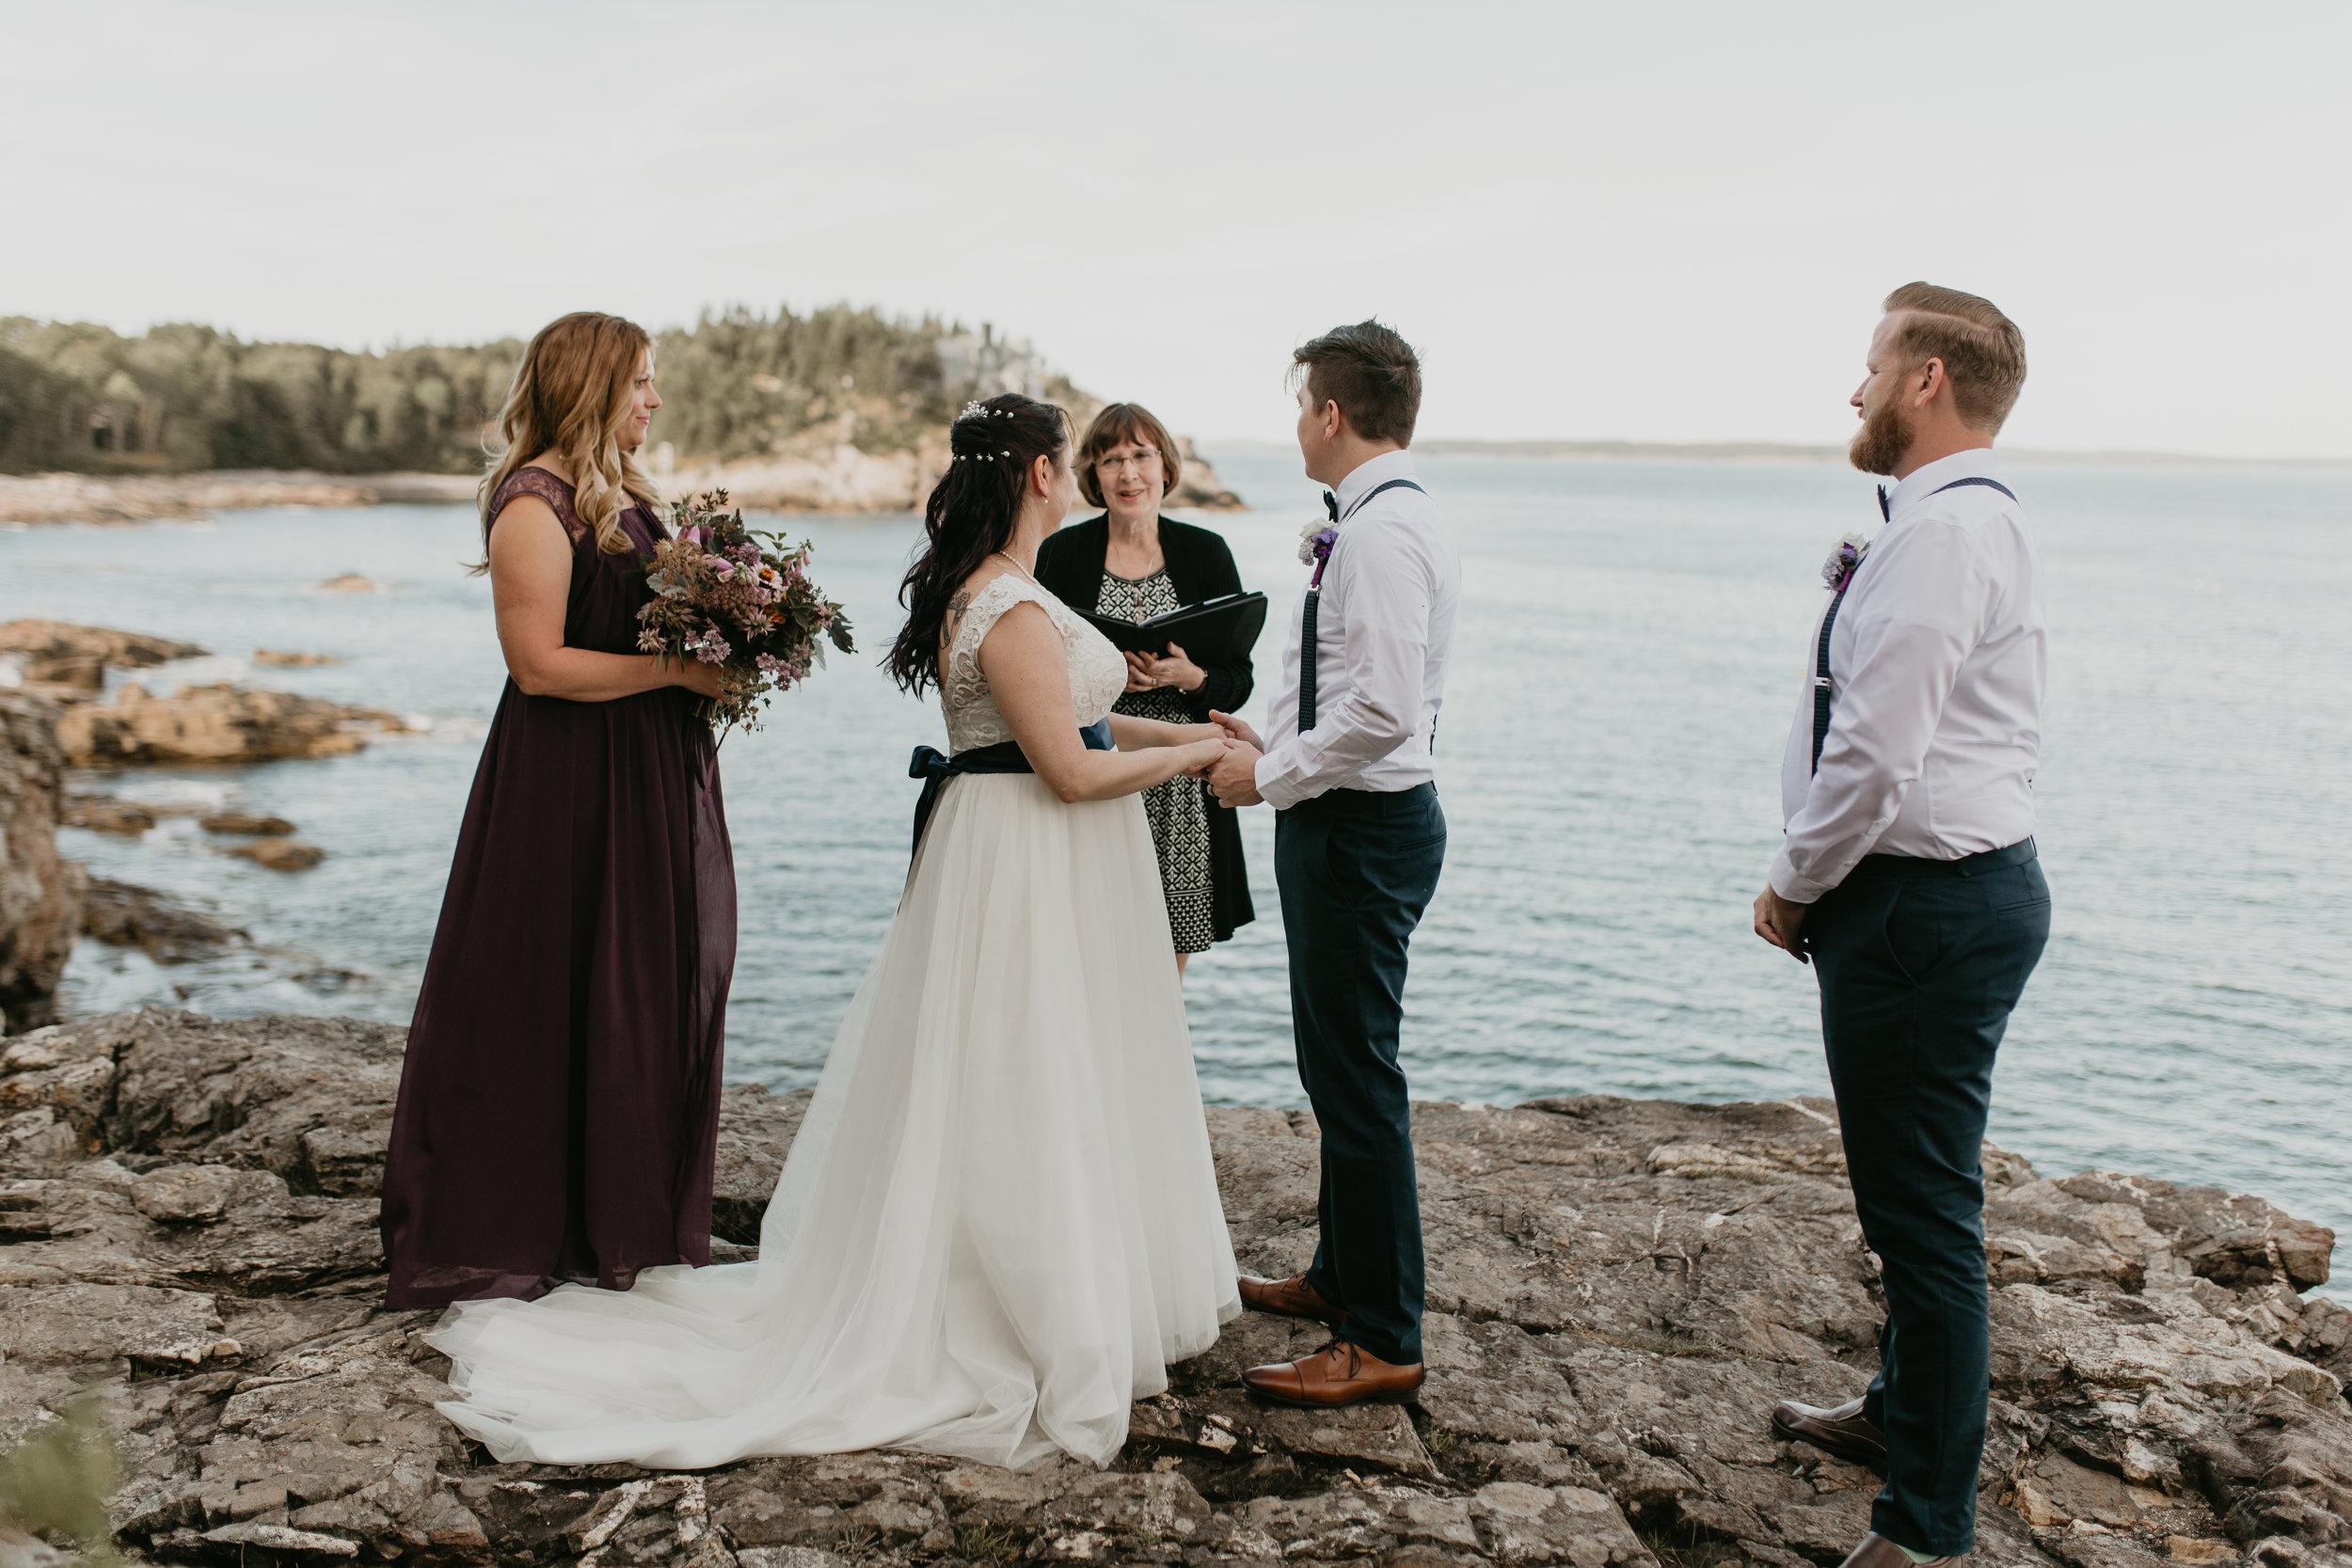 nicole-daacke-photography-Elopement-rocky-shoreline-coast-Acadia-National-Park-elopement-photographer-inspiration-maine-elopement-otter-cliffs-schoonic-head-point-24.jpg